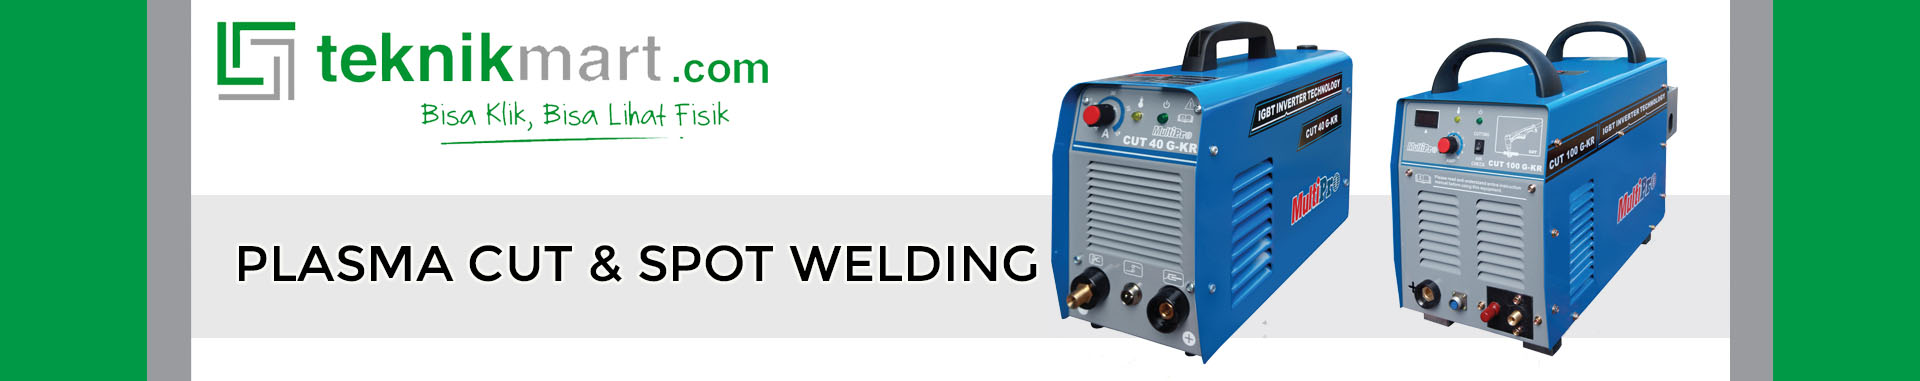 Plasma Cut & Spot Welding